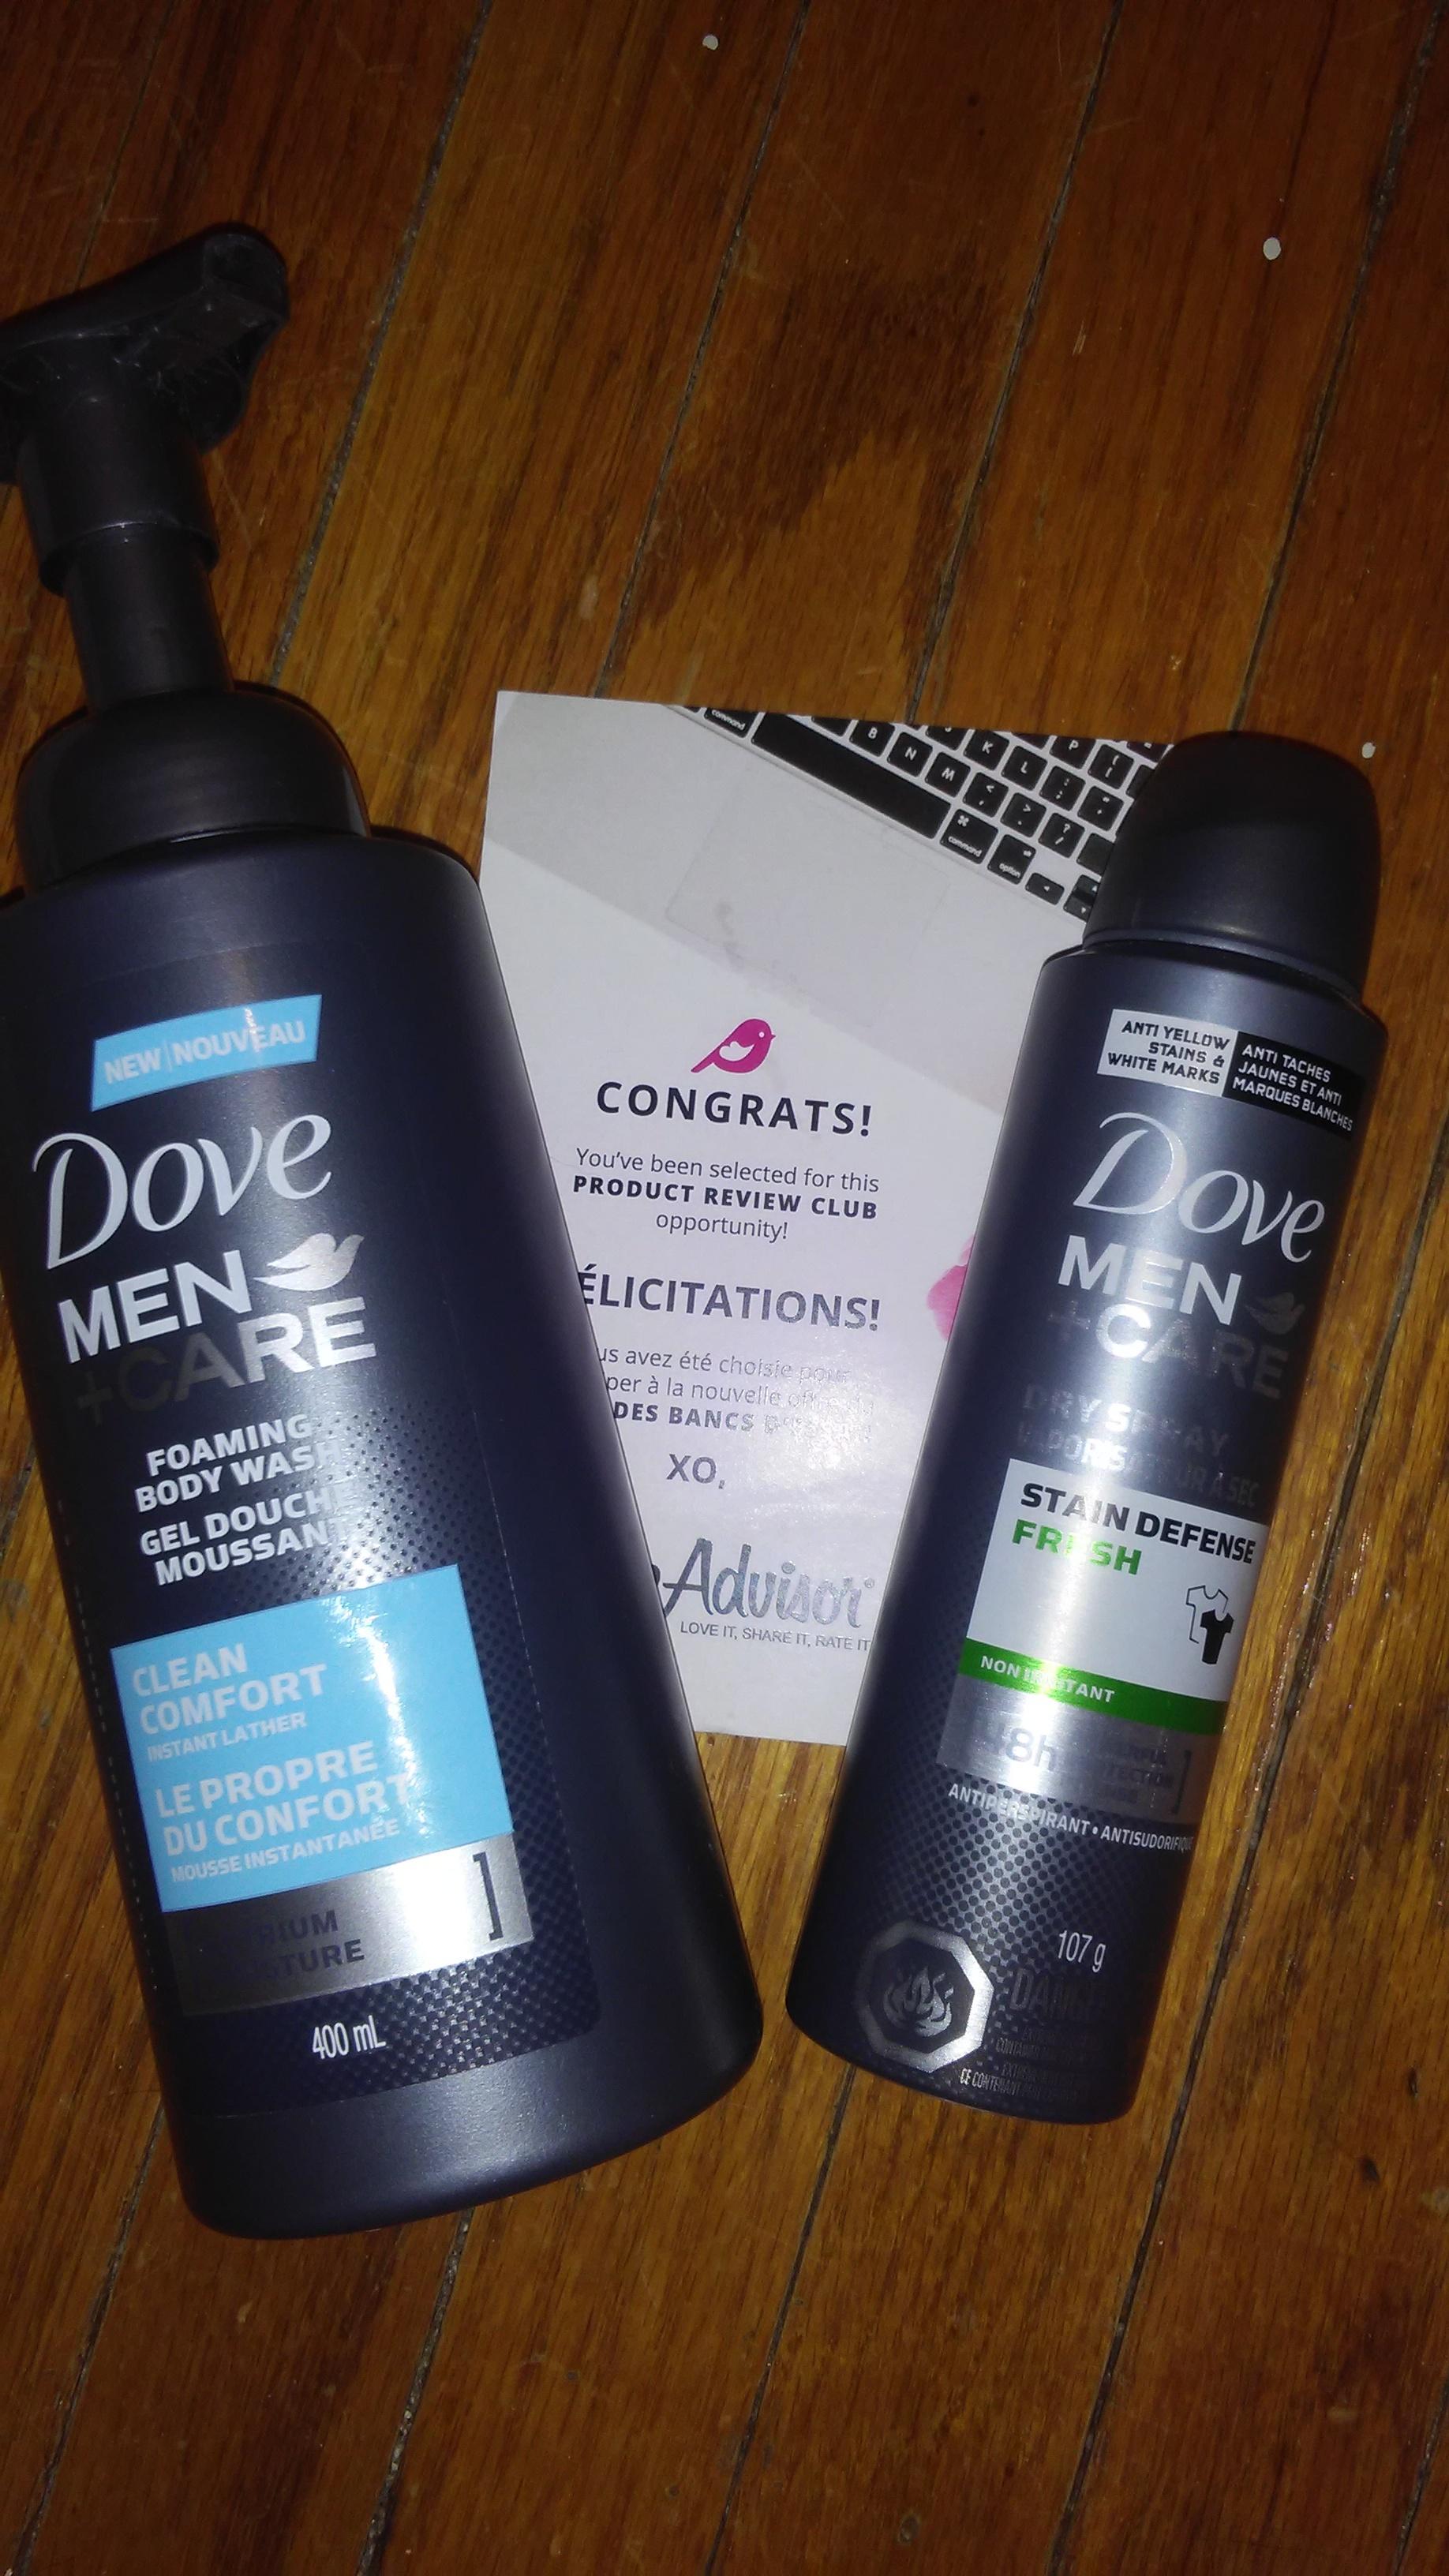 Dove Men Care Clean Comfort Foaming Body Wash Reviews In Men S Body Wash Chickadvisor